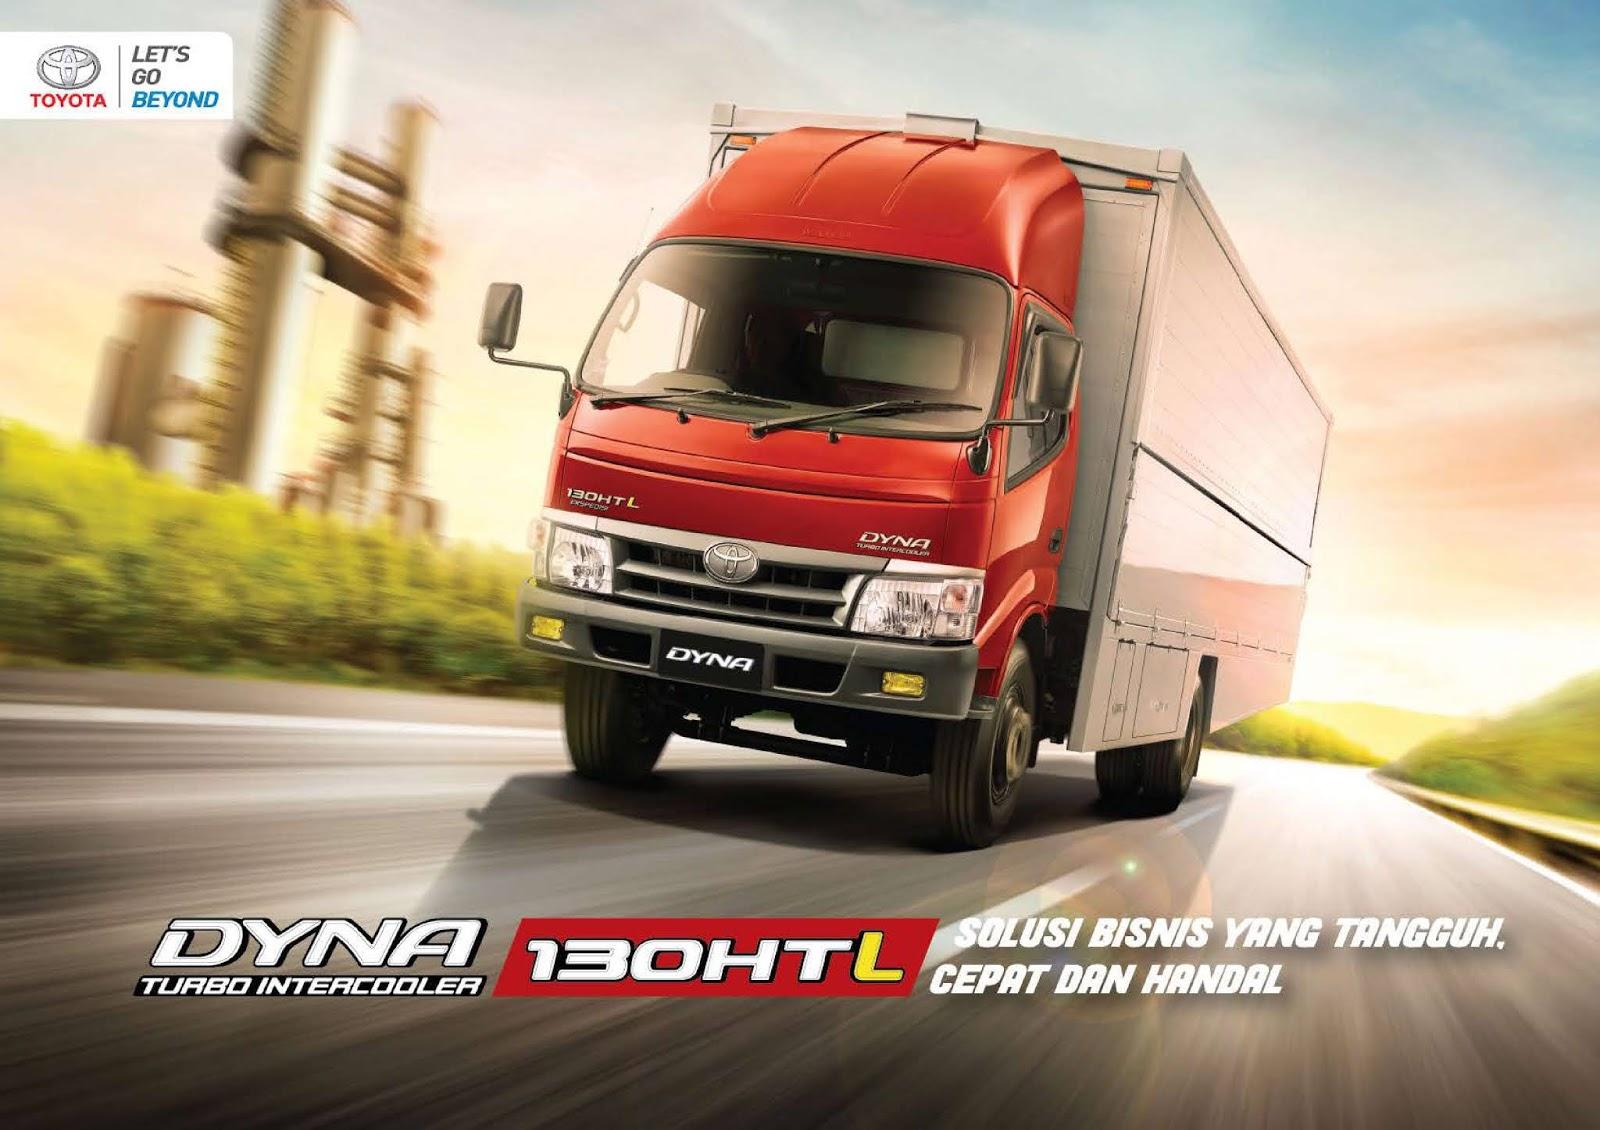 New Toyota Dyna - Info Spesifikasi, Harga Toyota Dyna Bali & Promo Toyota Dyna Bali